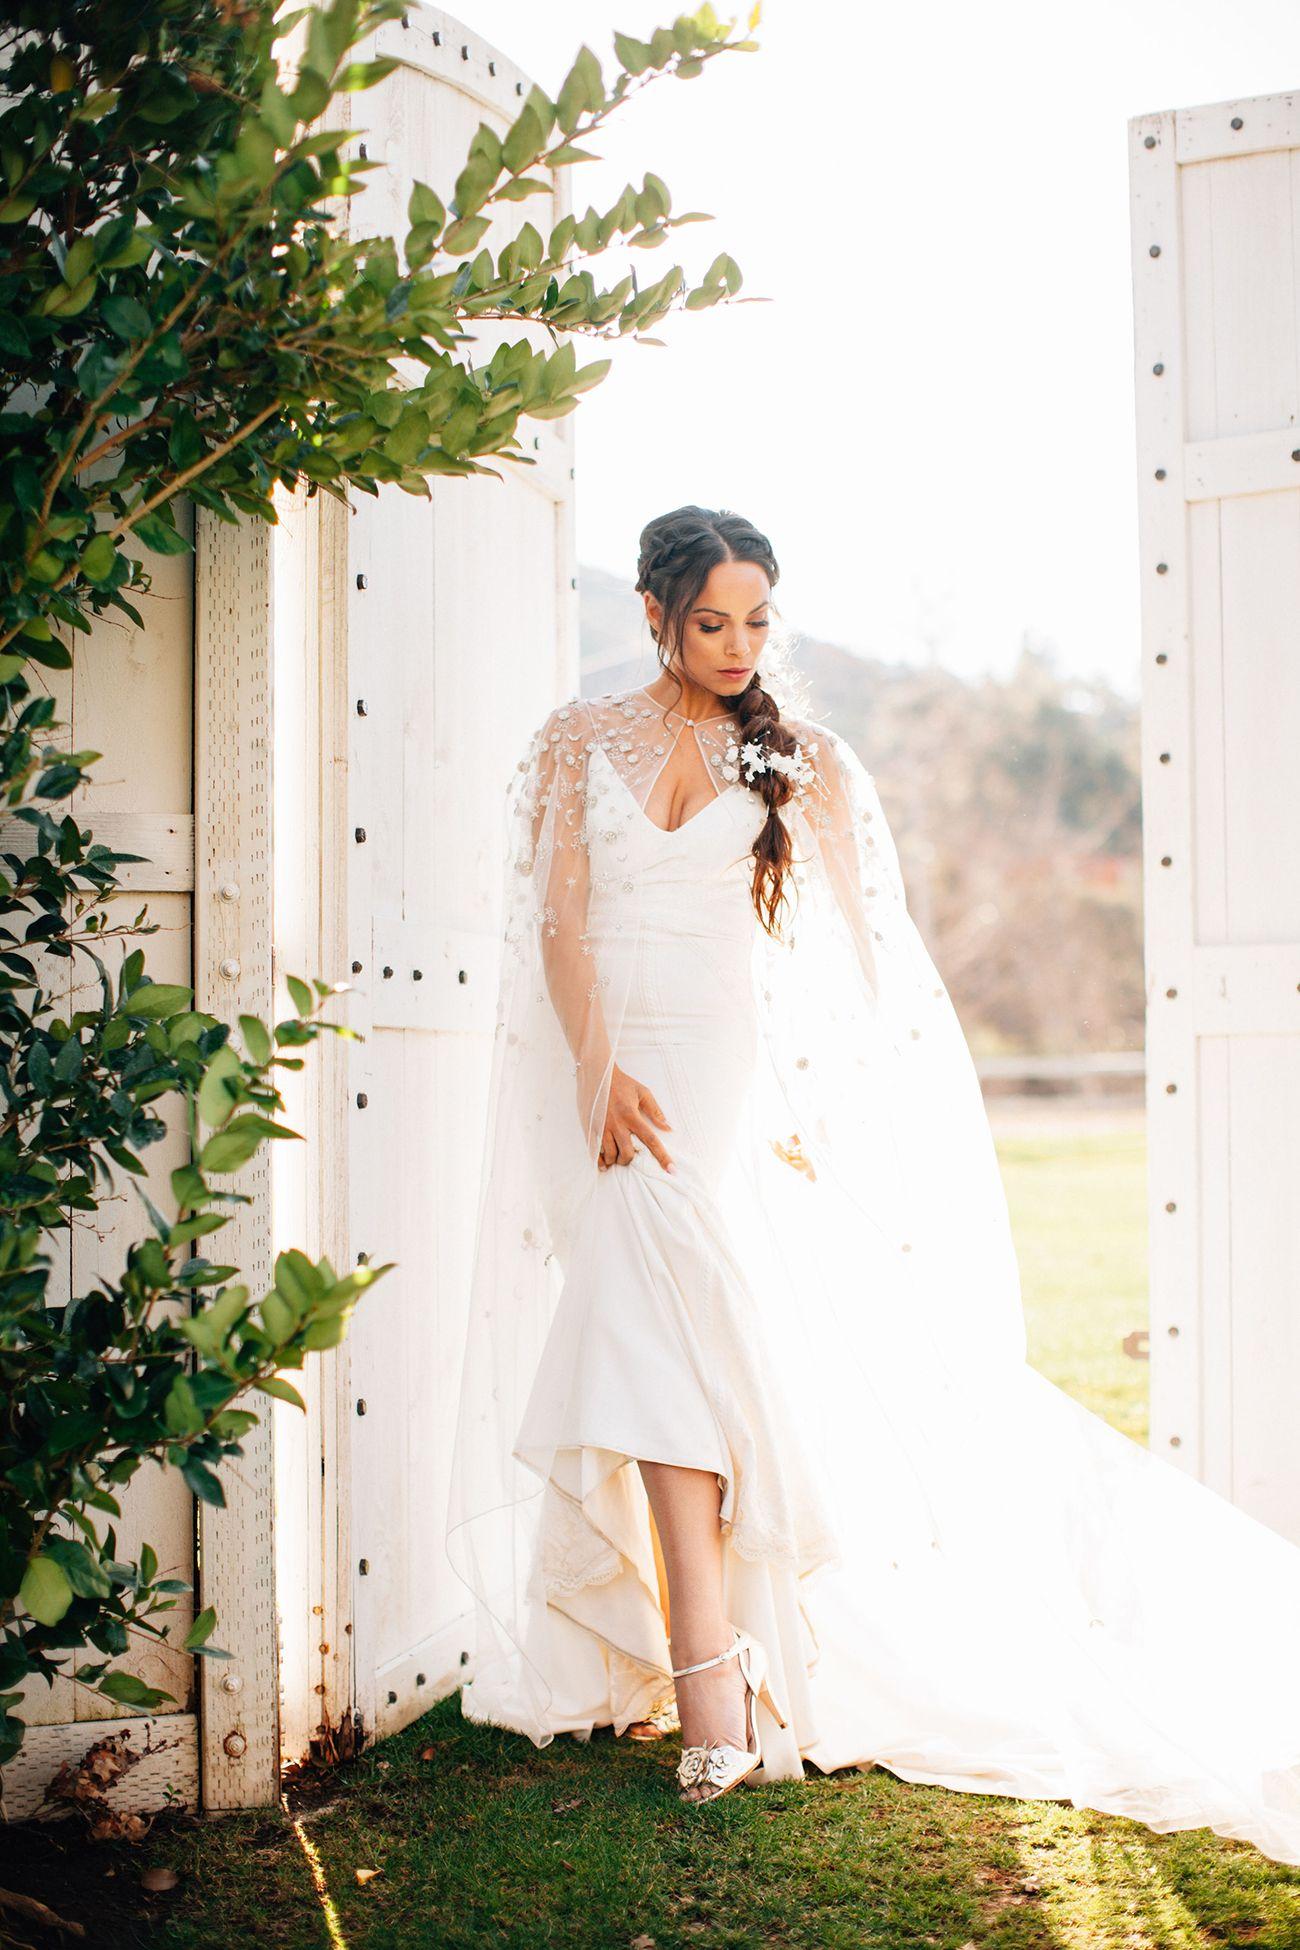 Introducing The Gorgeous Gws Zadie Shoe With Rachel Simpson Green Wedding Shoes Wedding Dress Styles Princess Ball Gowns Bridal Fashion Week [ 1950 x 1300 Pixel ]